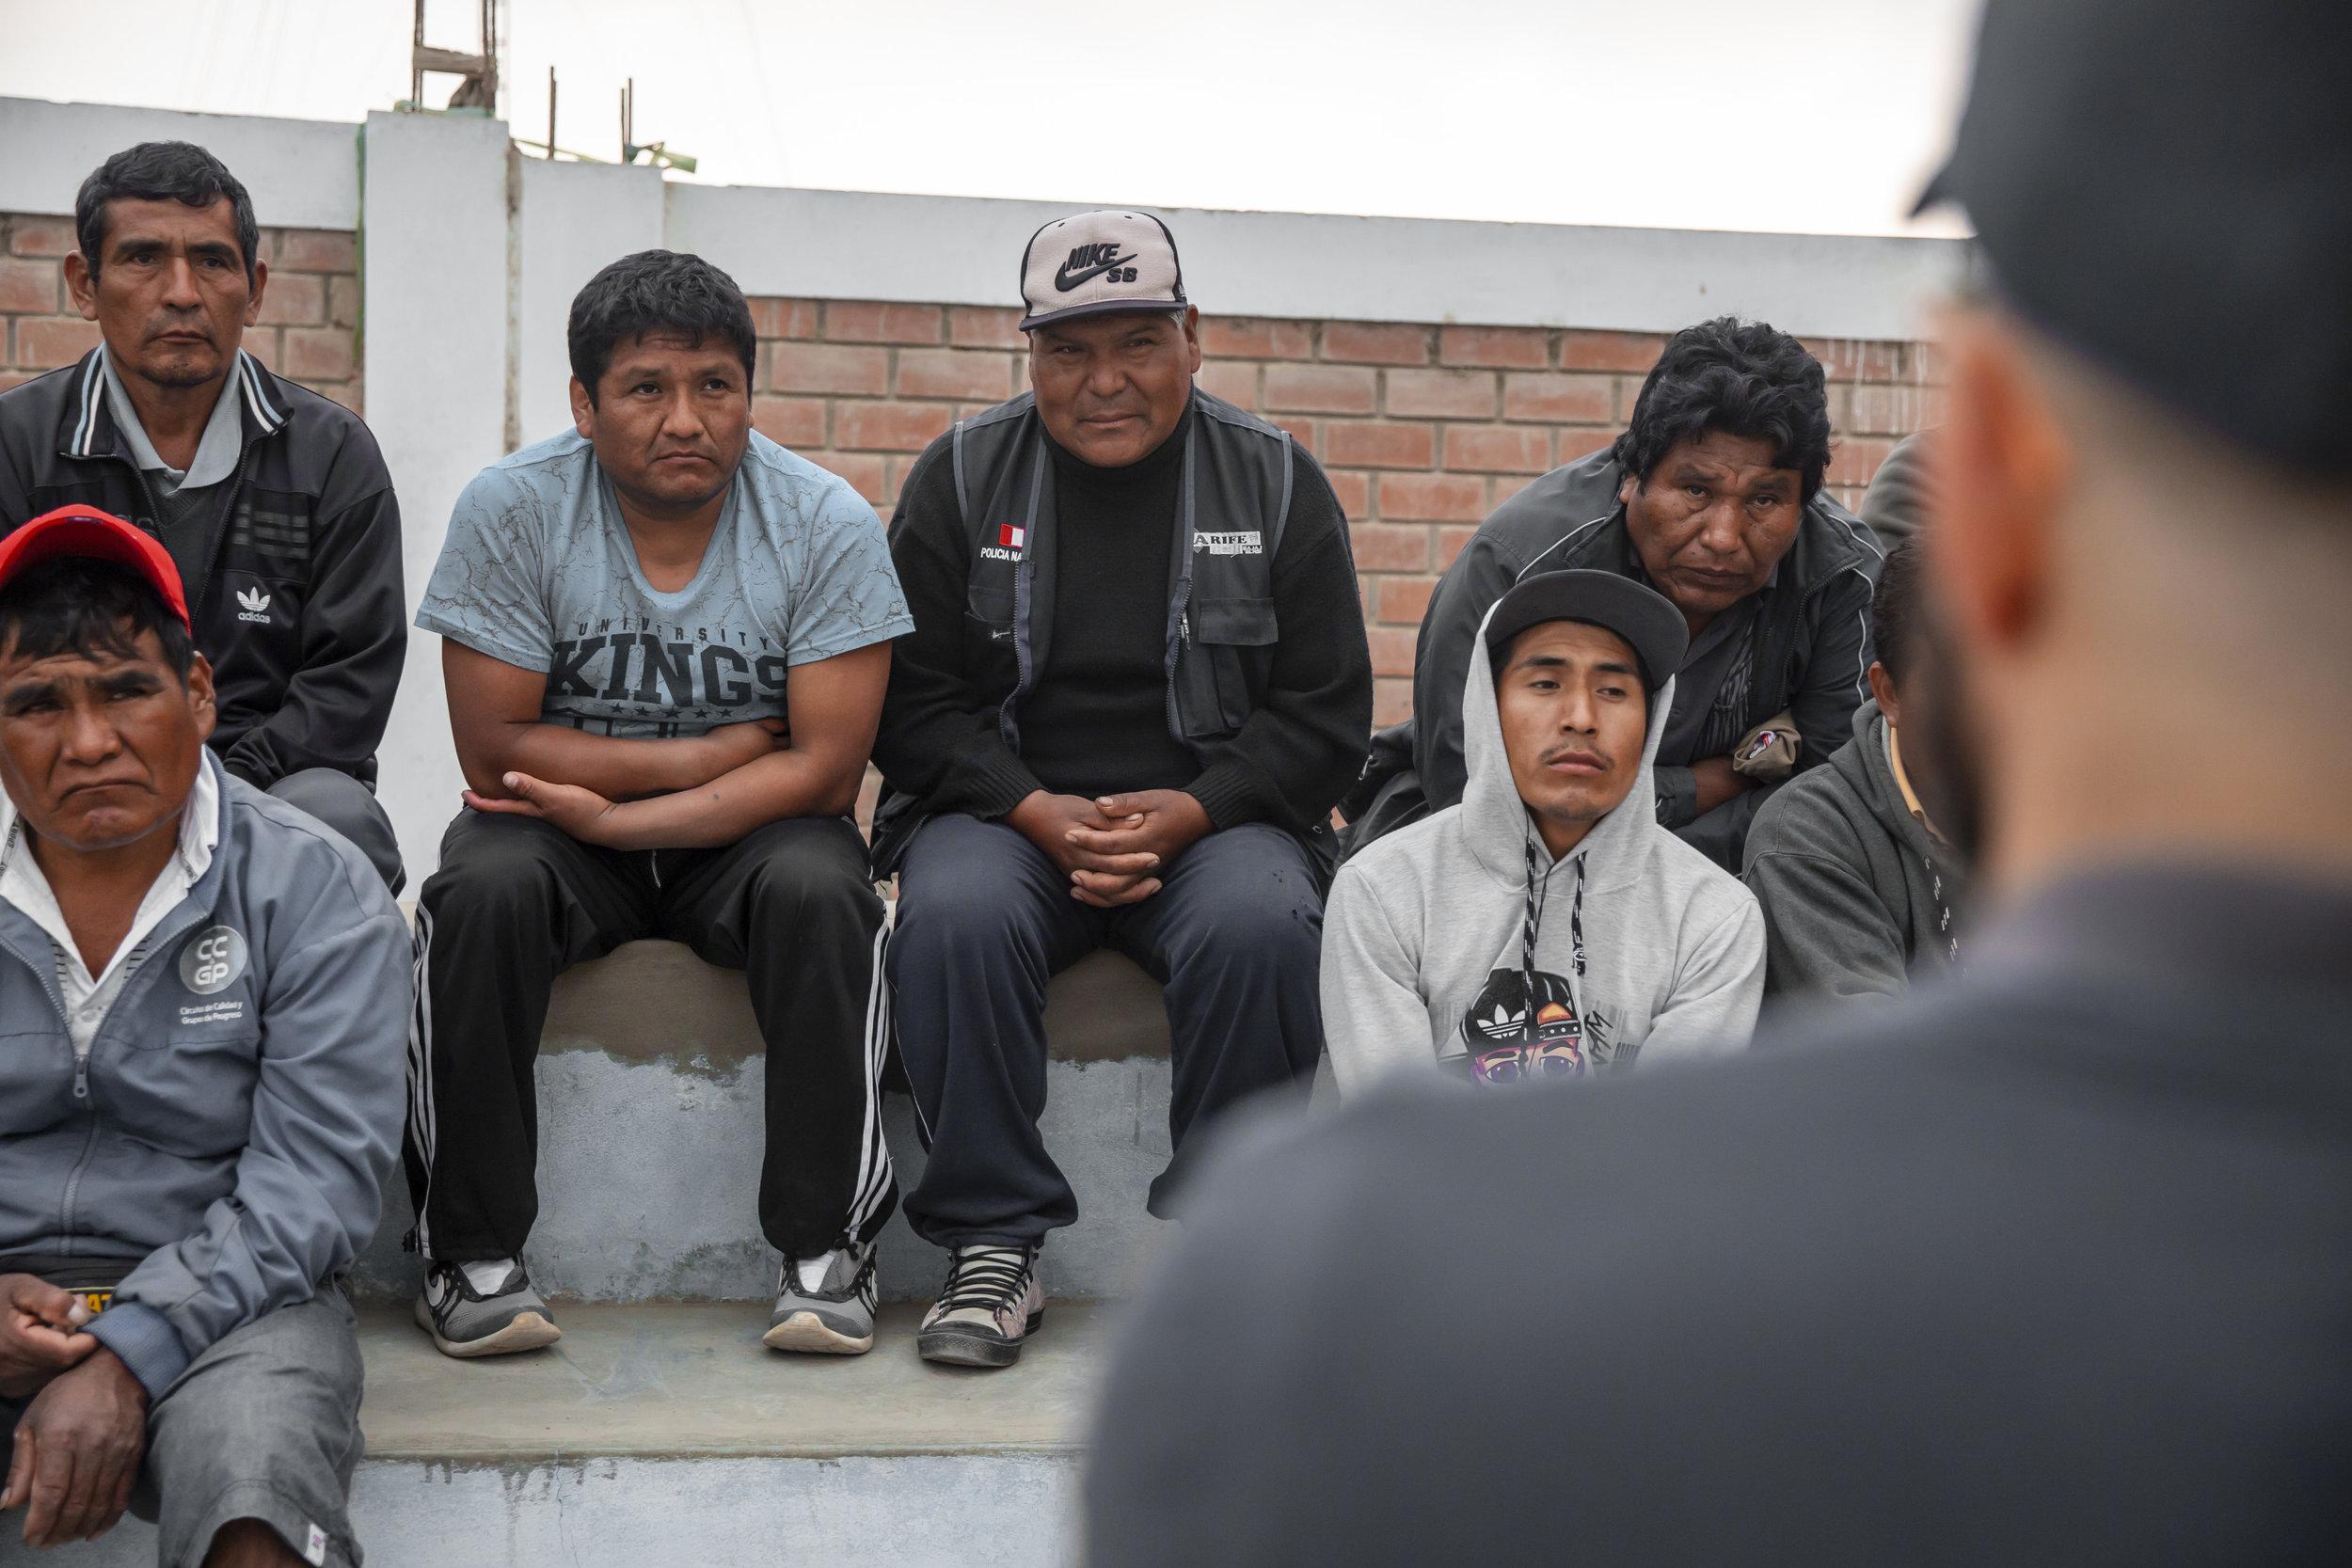 Simone speaking with members of the Beatita de Humay Fishers' Cooperative.   Ana Sotelo for NESsT.